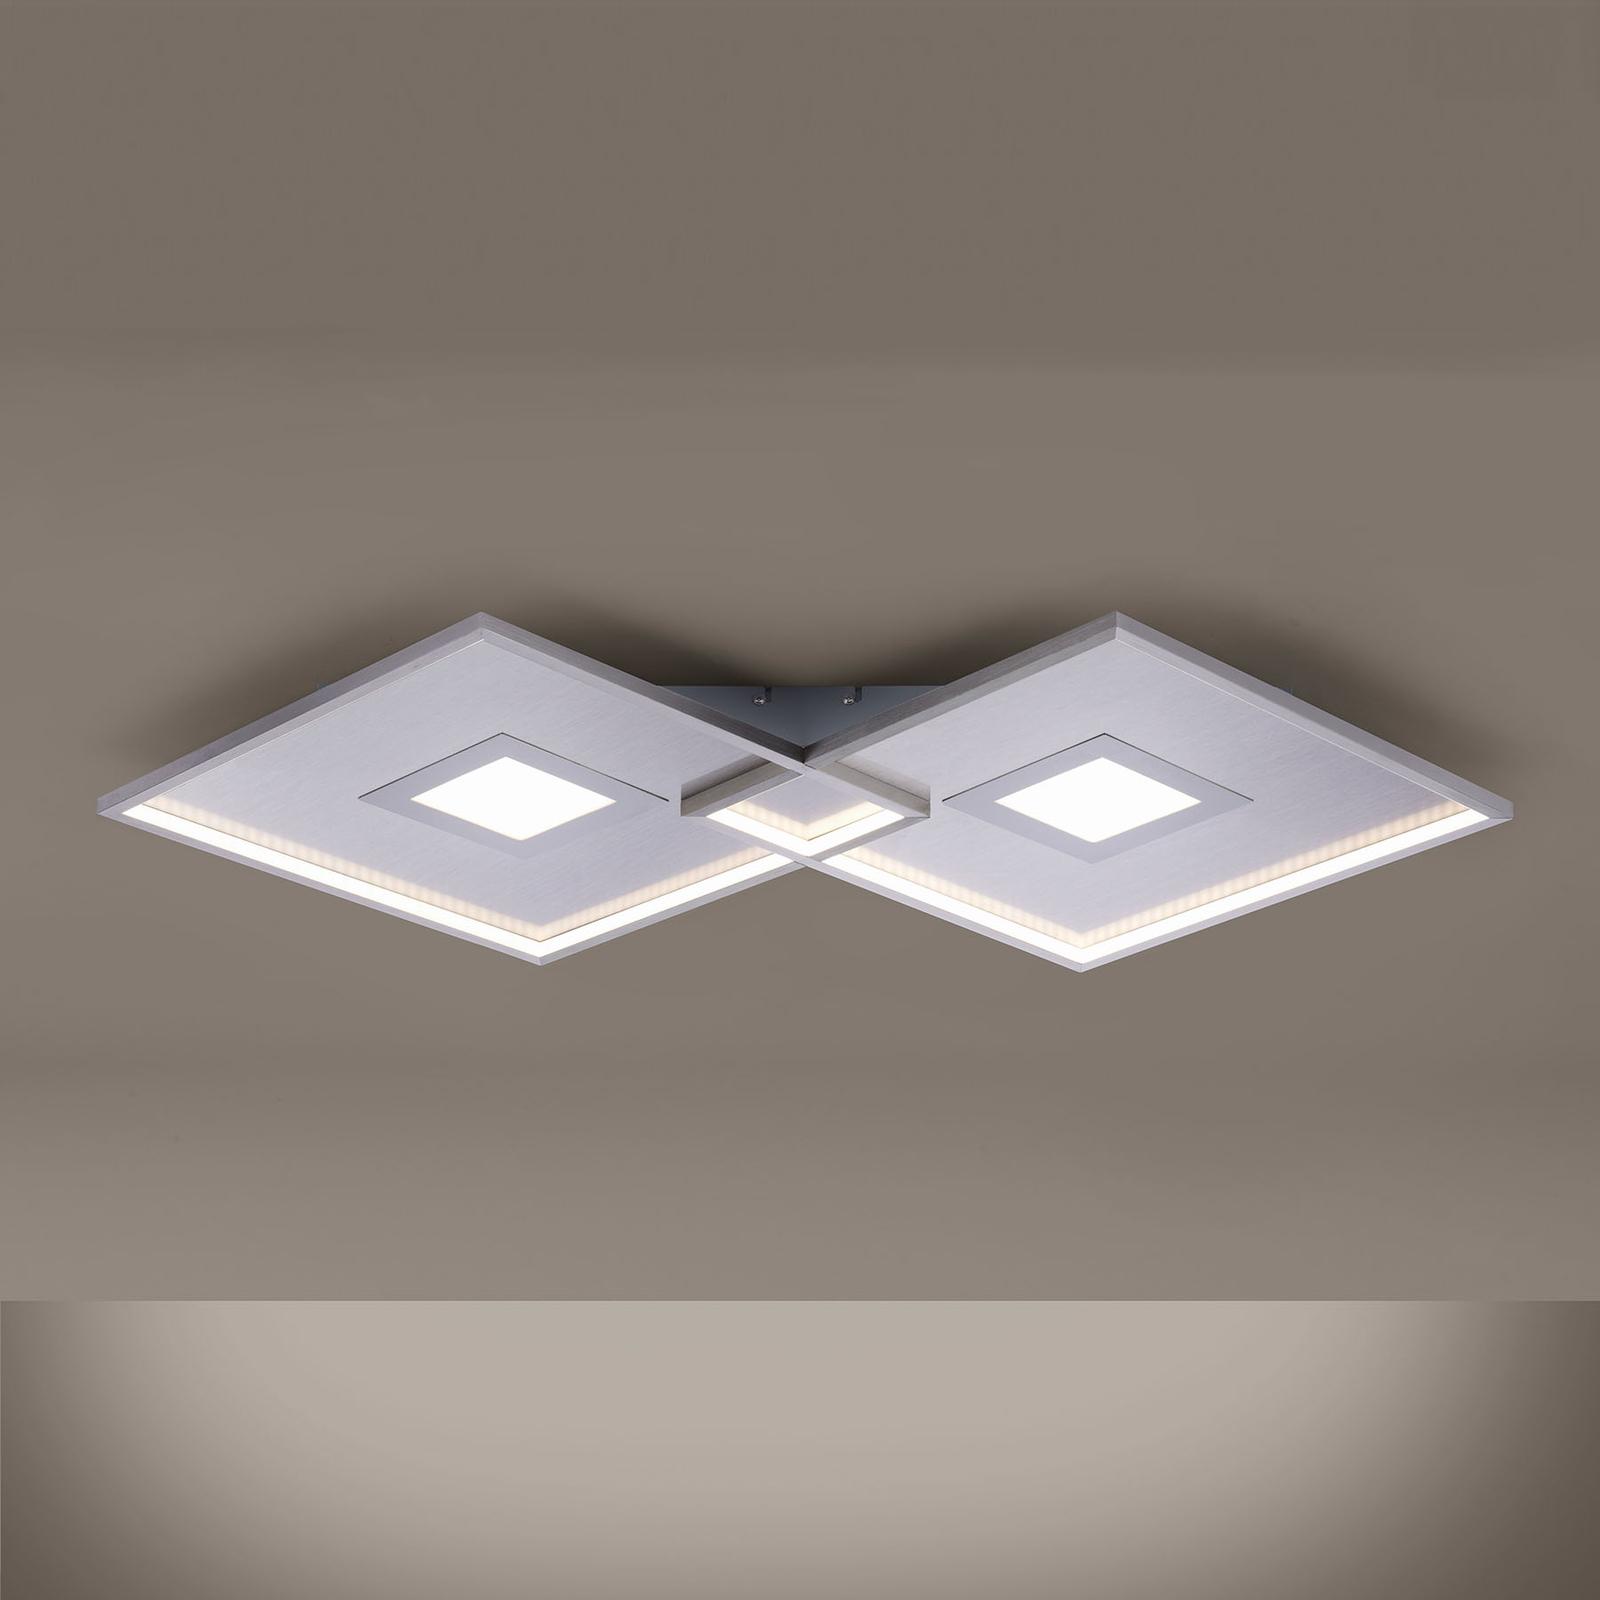 LED plafondlamp Amara, twee vierkanten, zilver